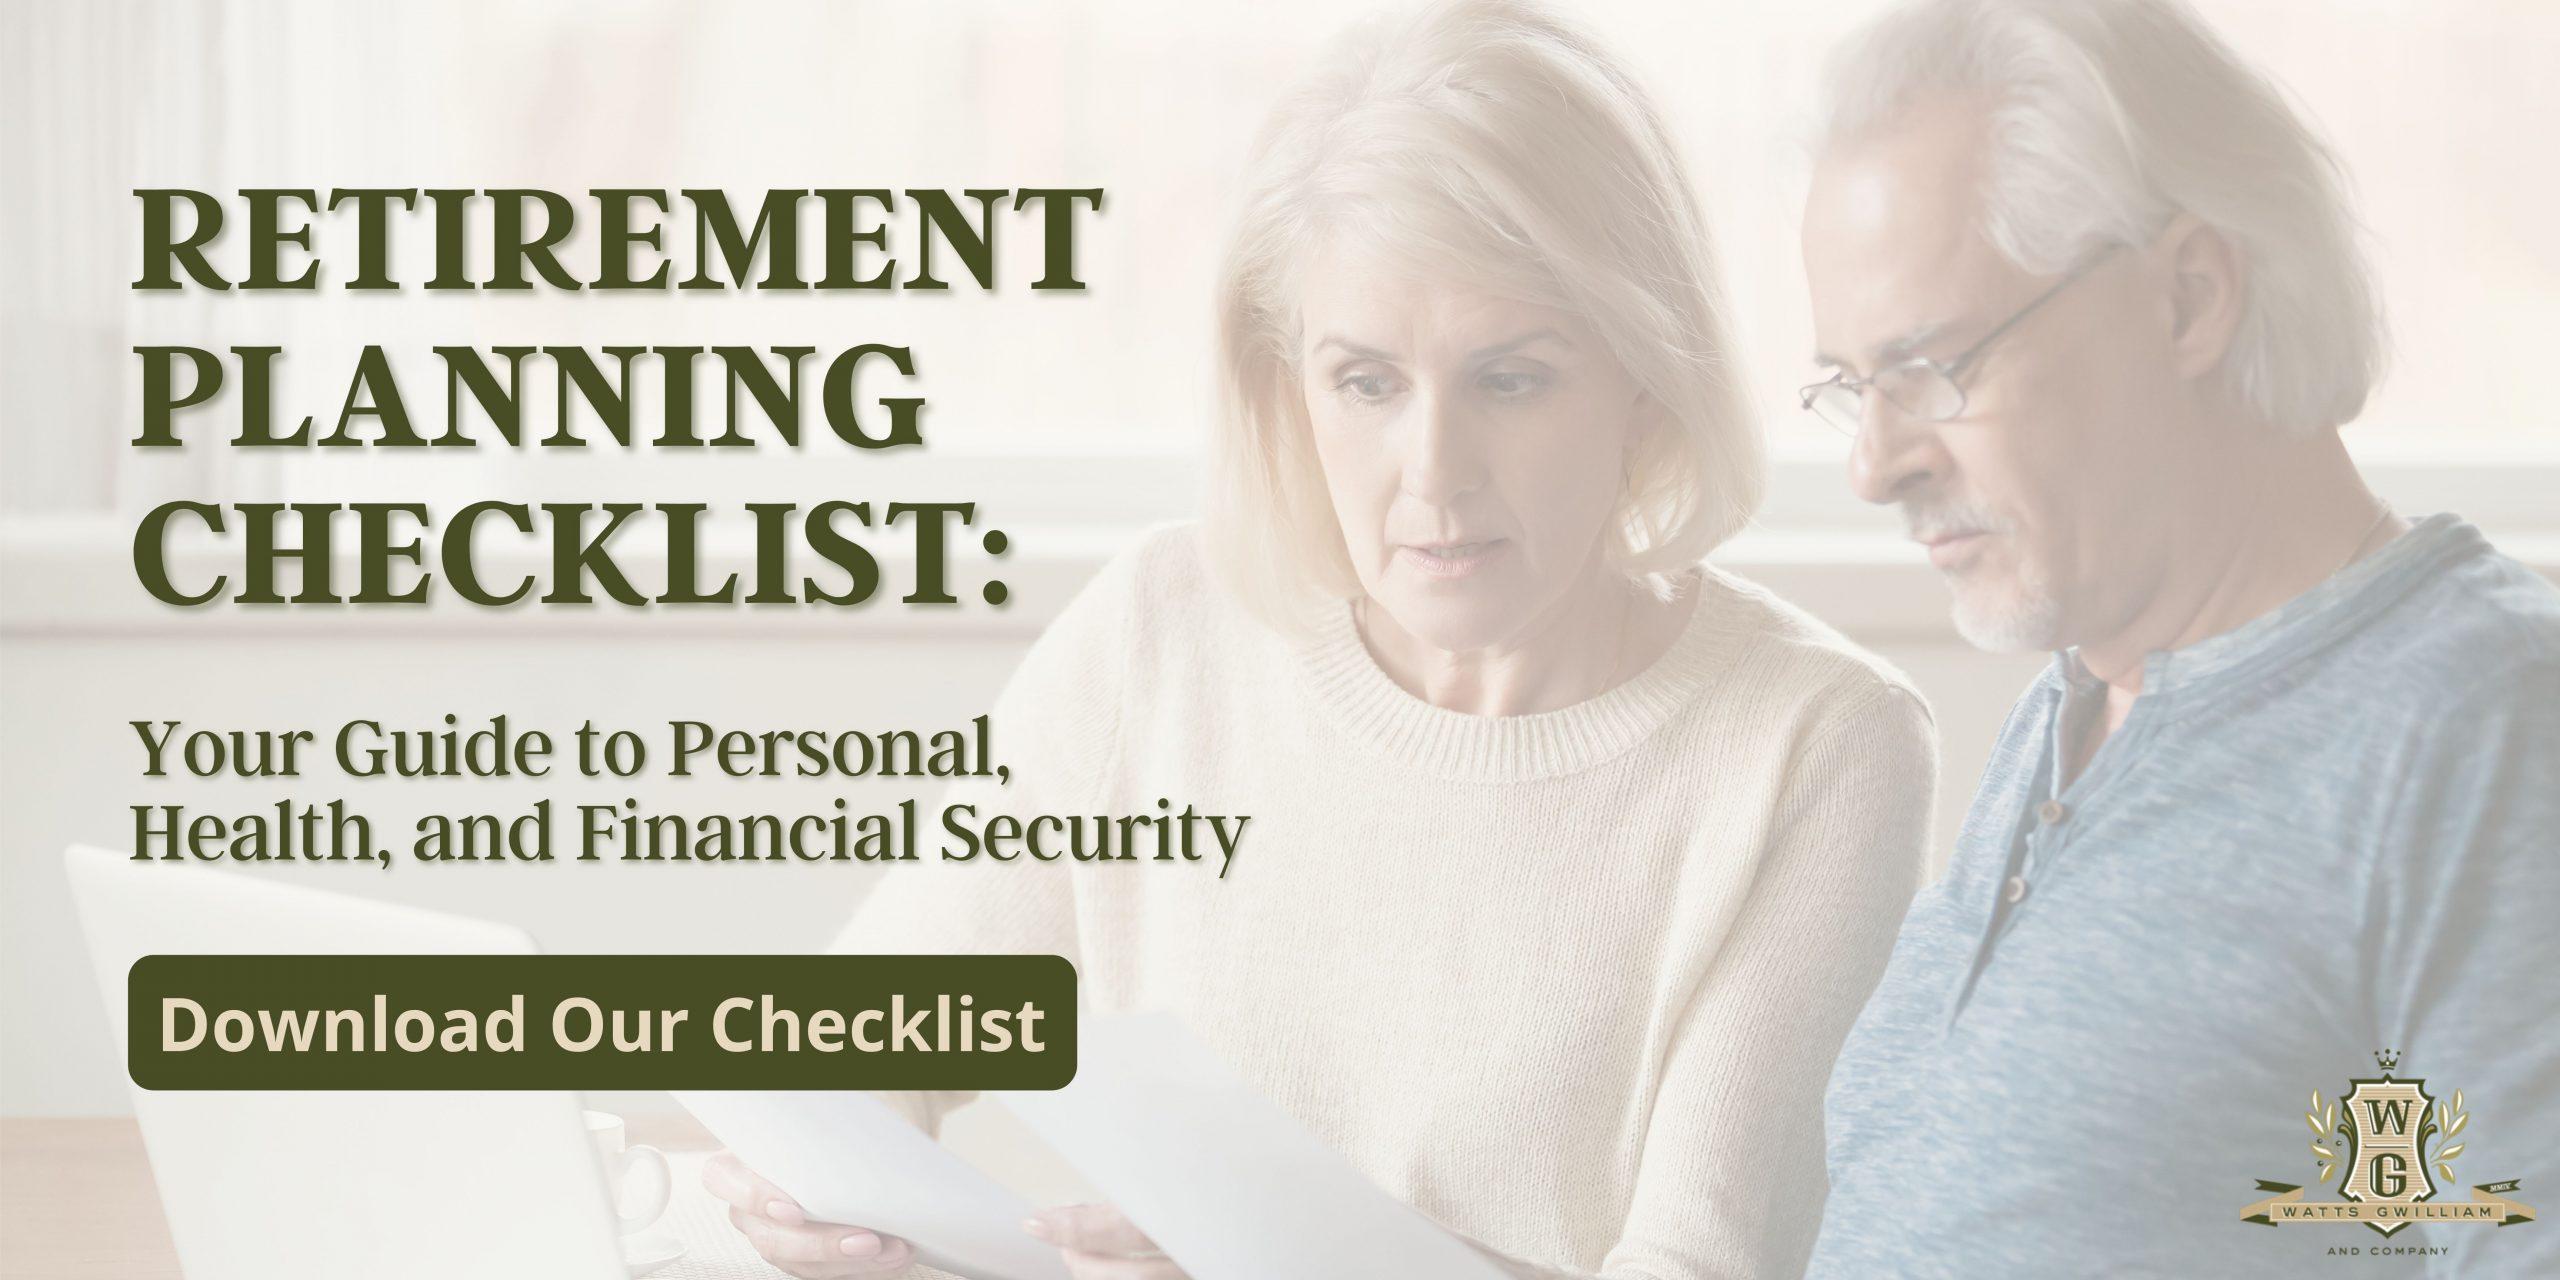 Download our Retirement Planning Checklist